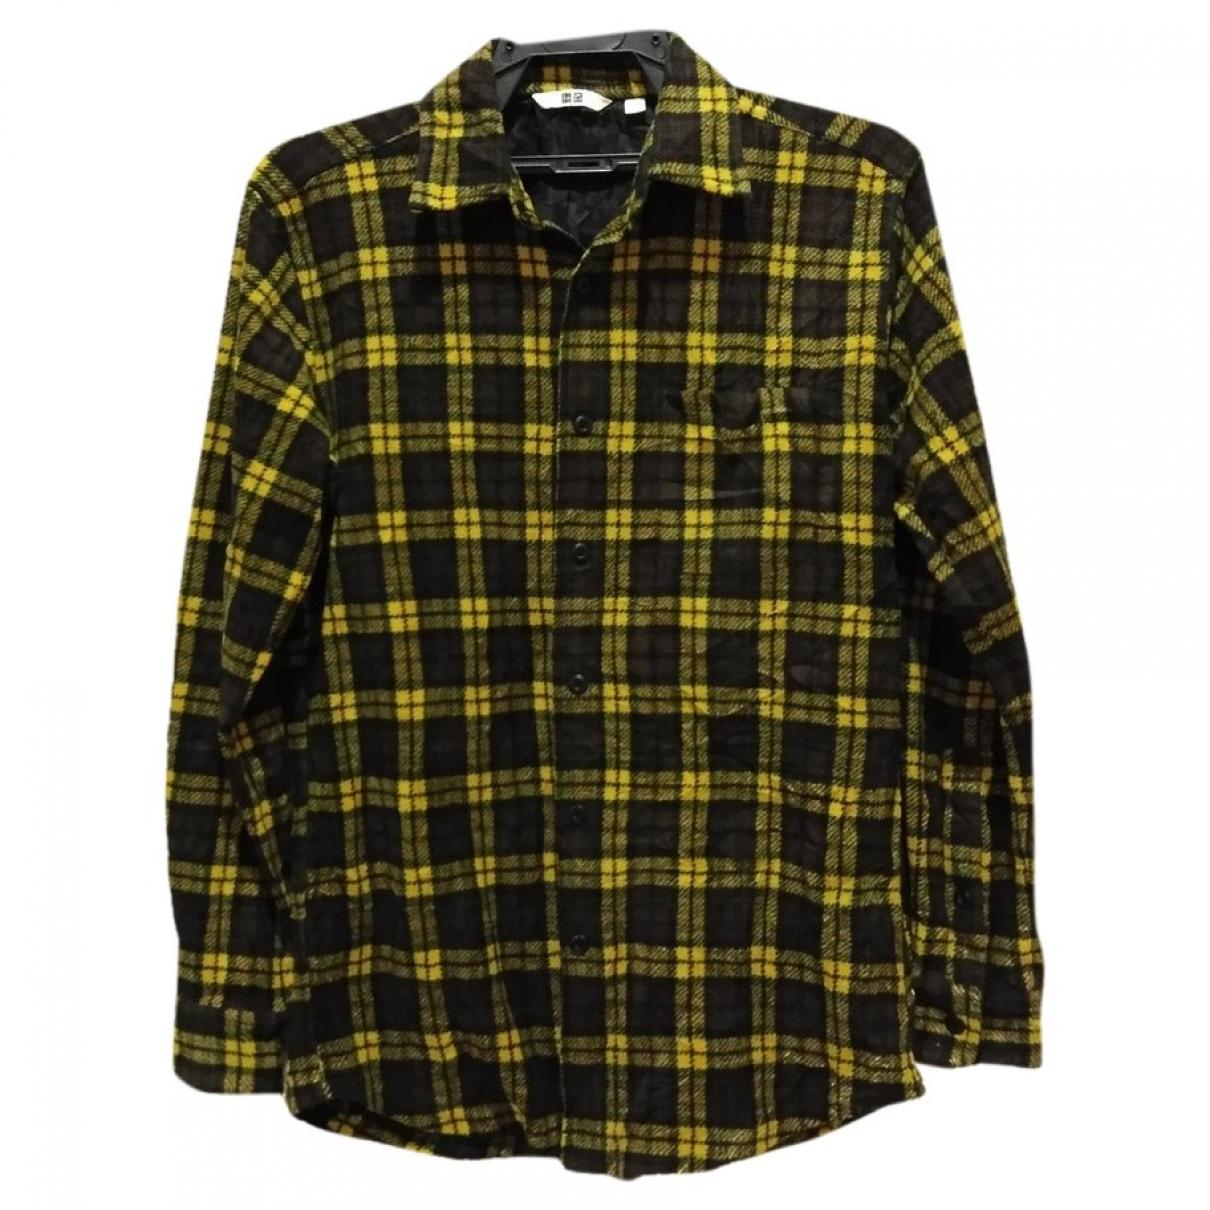 Uniqlo \N Shirts for Men M International